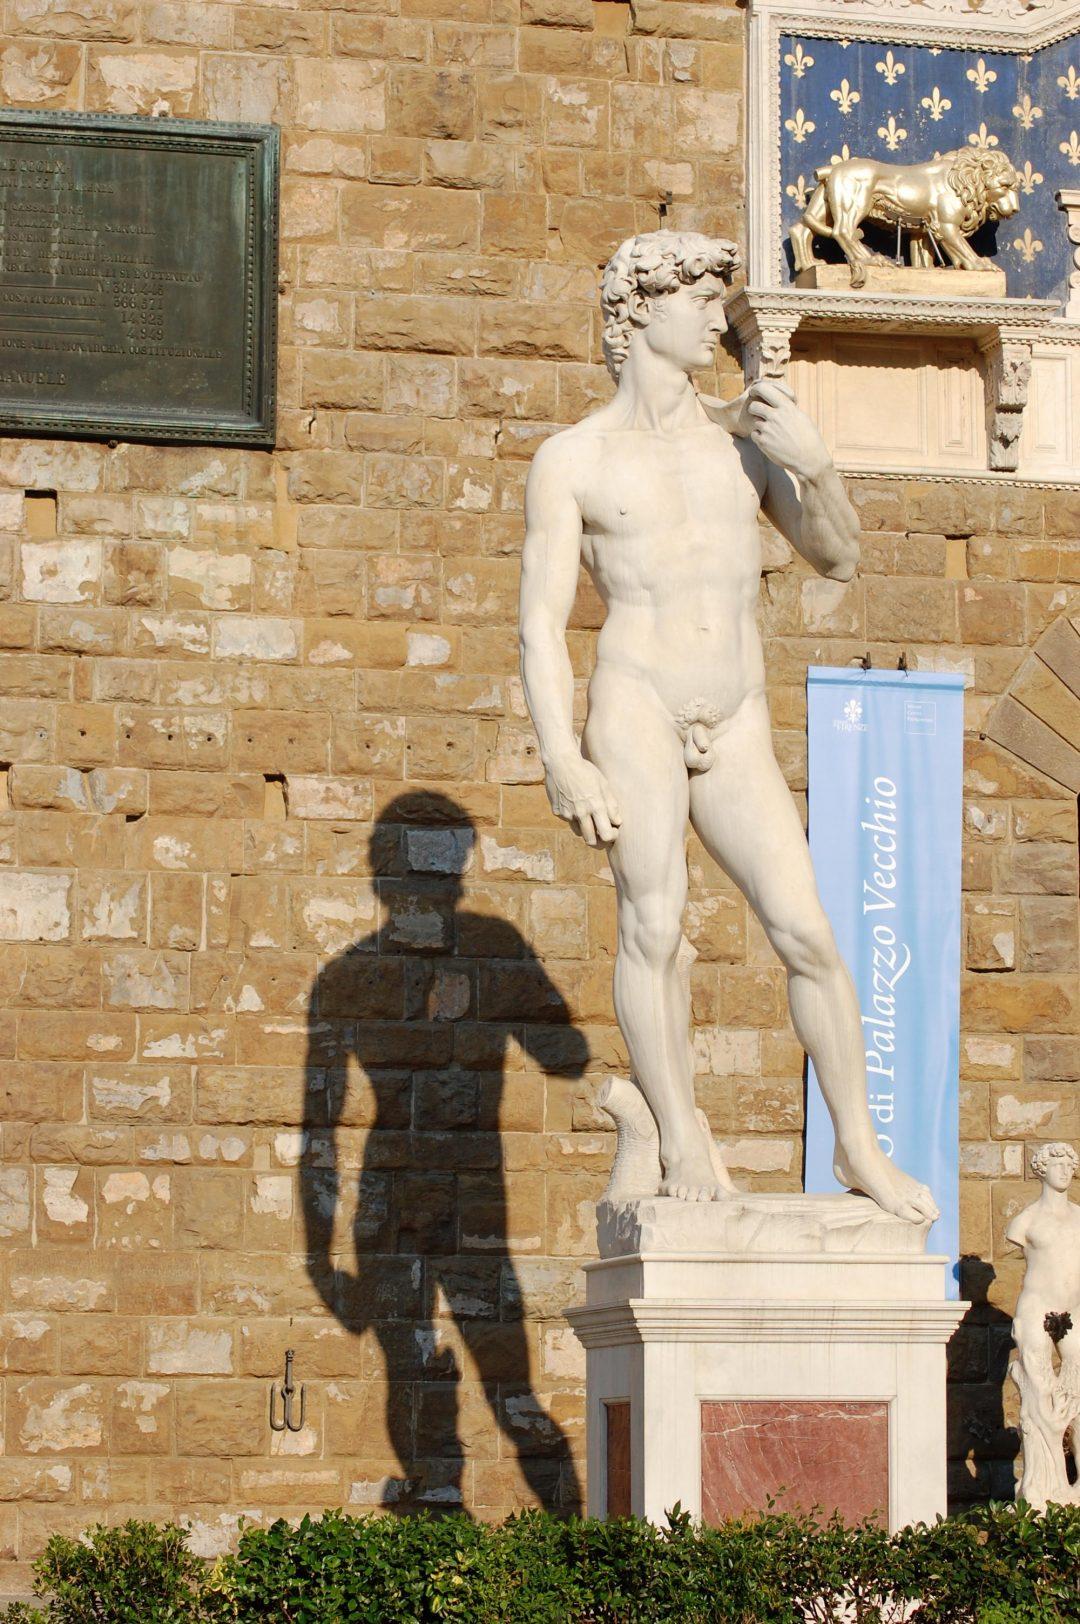 Top Musei 2016: Italia, Europa, Mondo